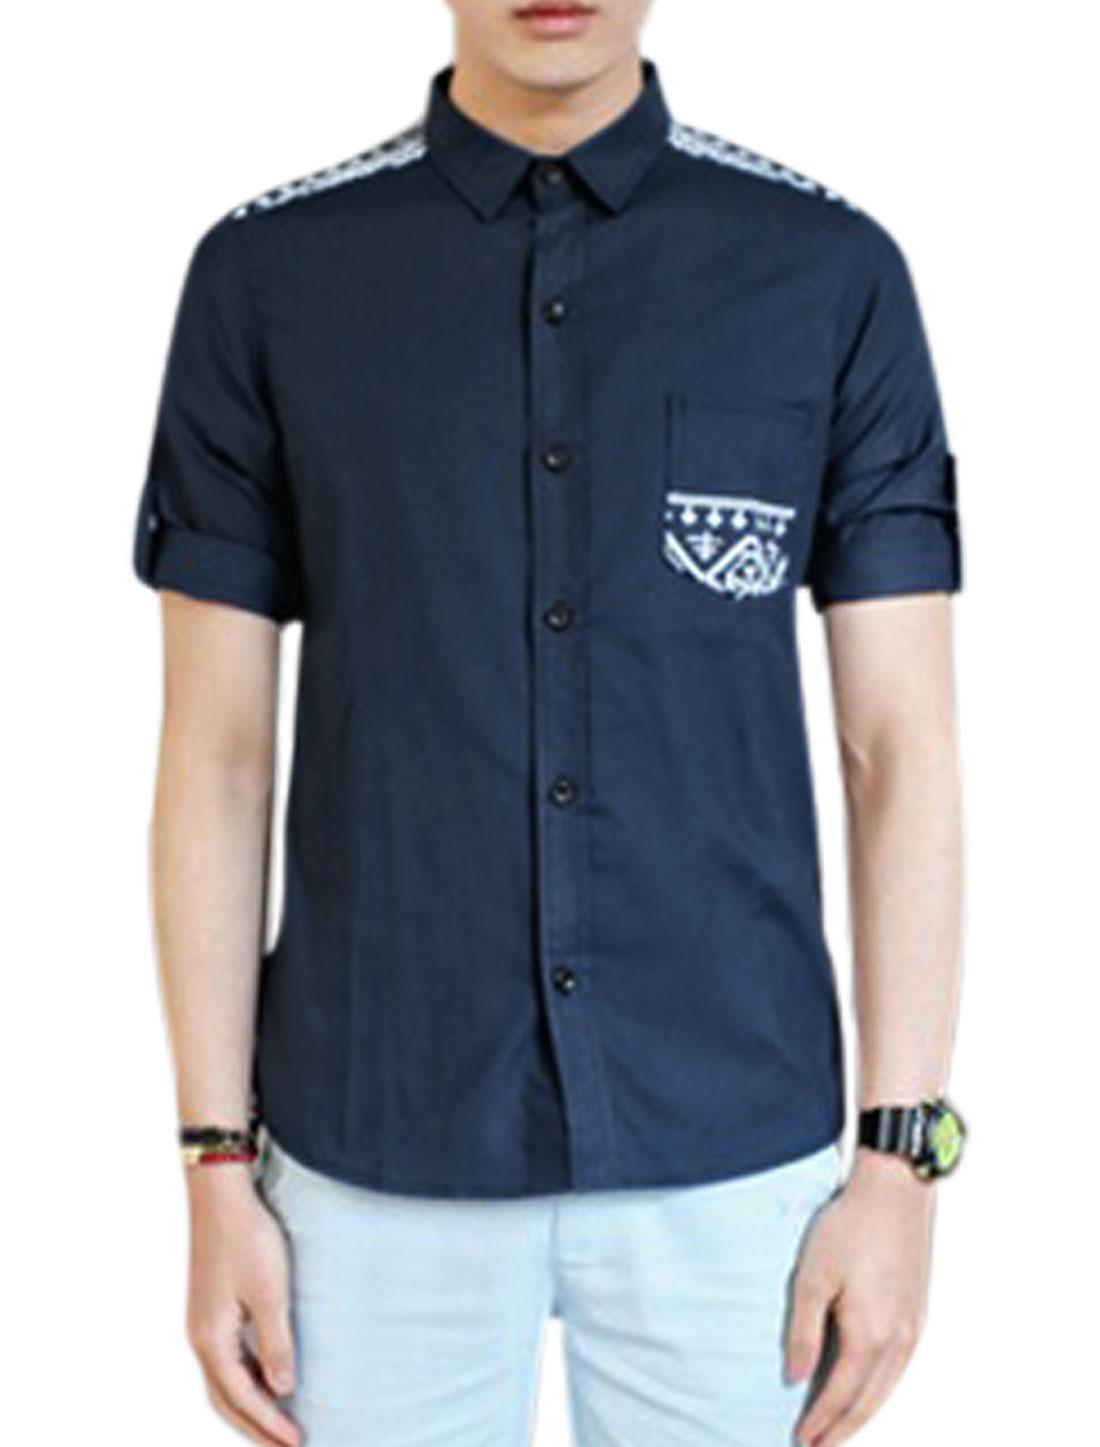 Men Geometric Prints Roll Up Cuffs Splicing Slim Top Shirt Navy Blue M